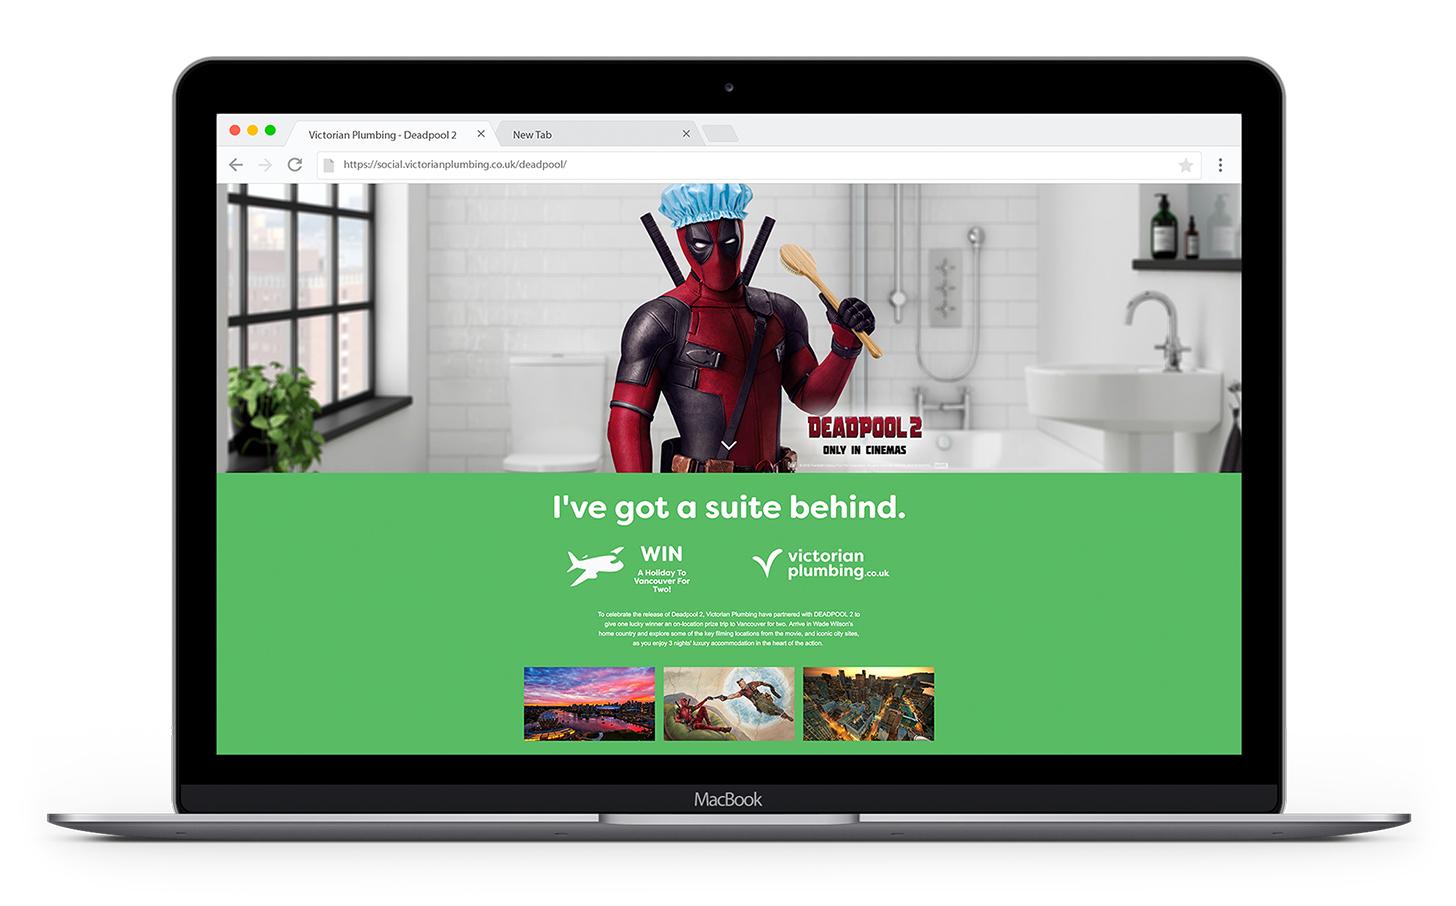 Deadpool 2 Film Partnership Victorian Plumbing Microsite Promotion